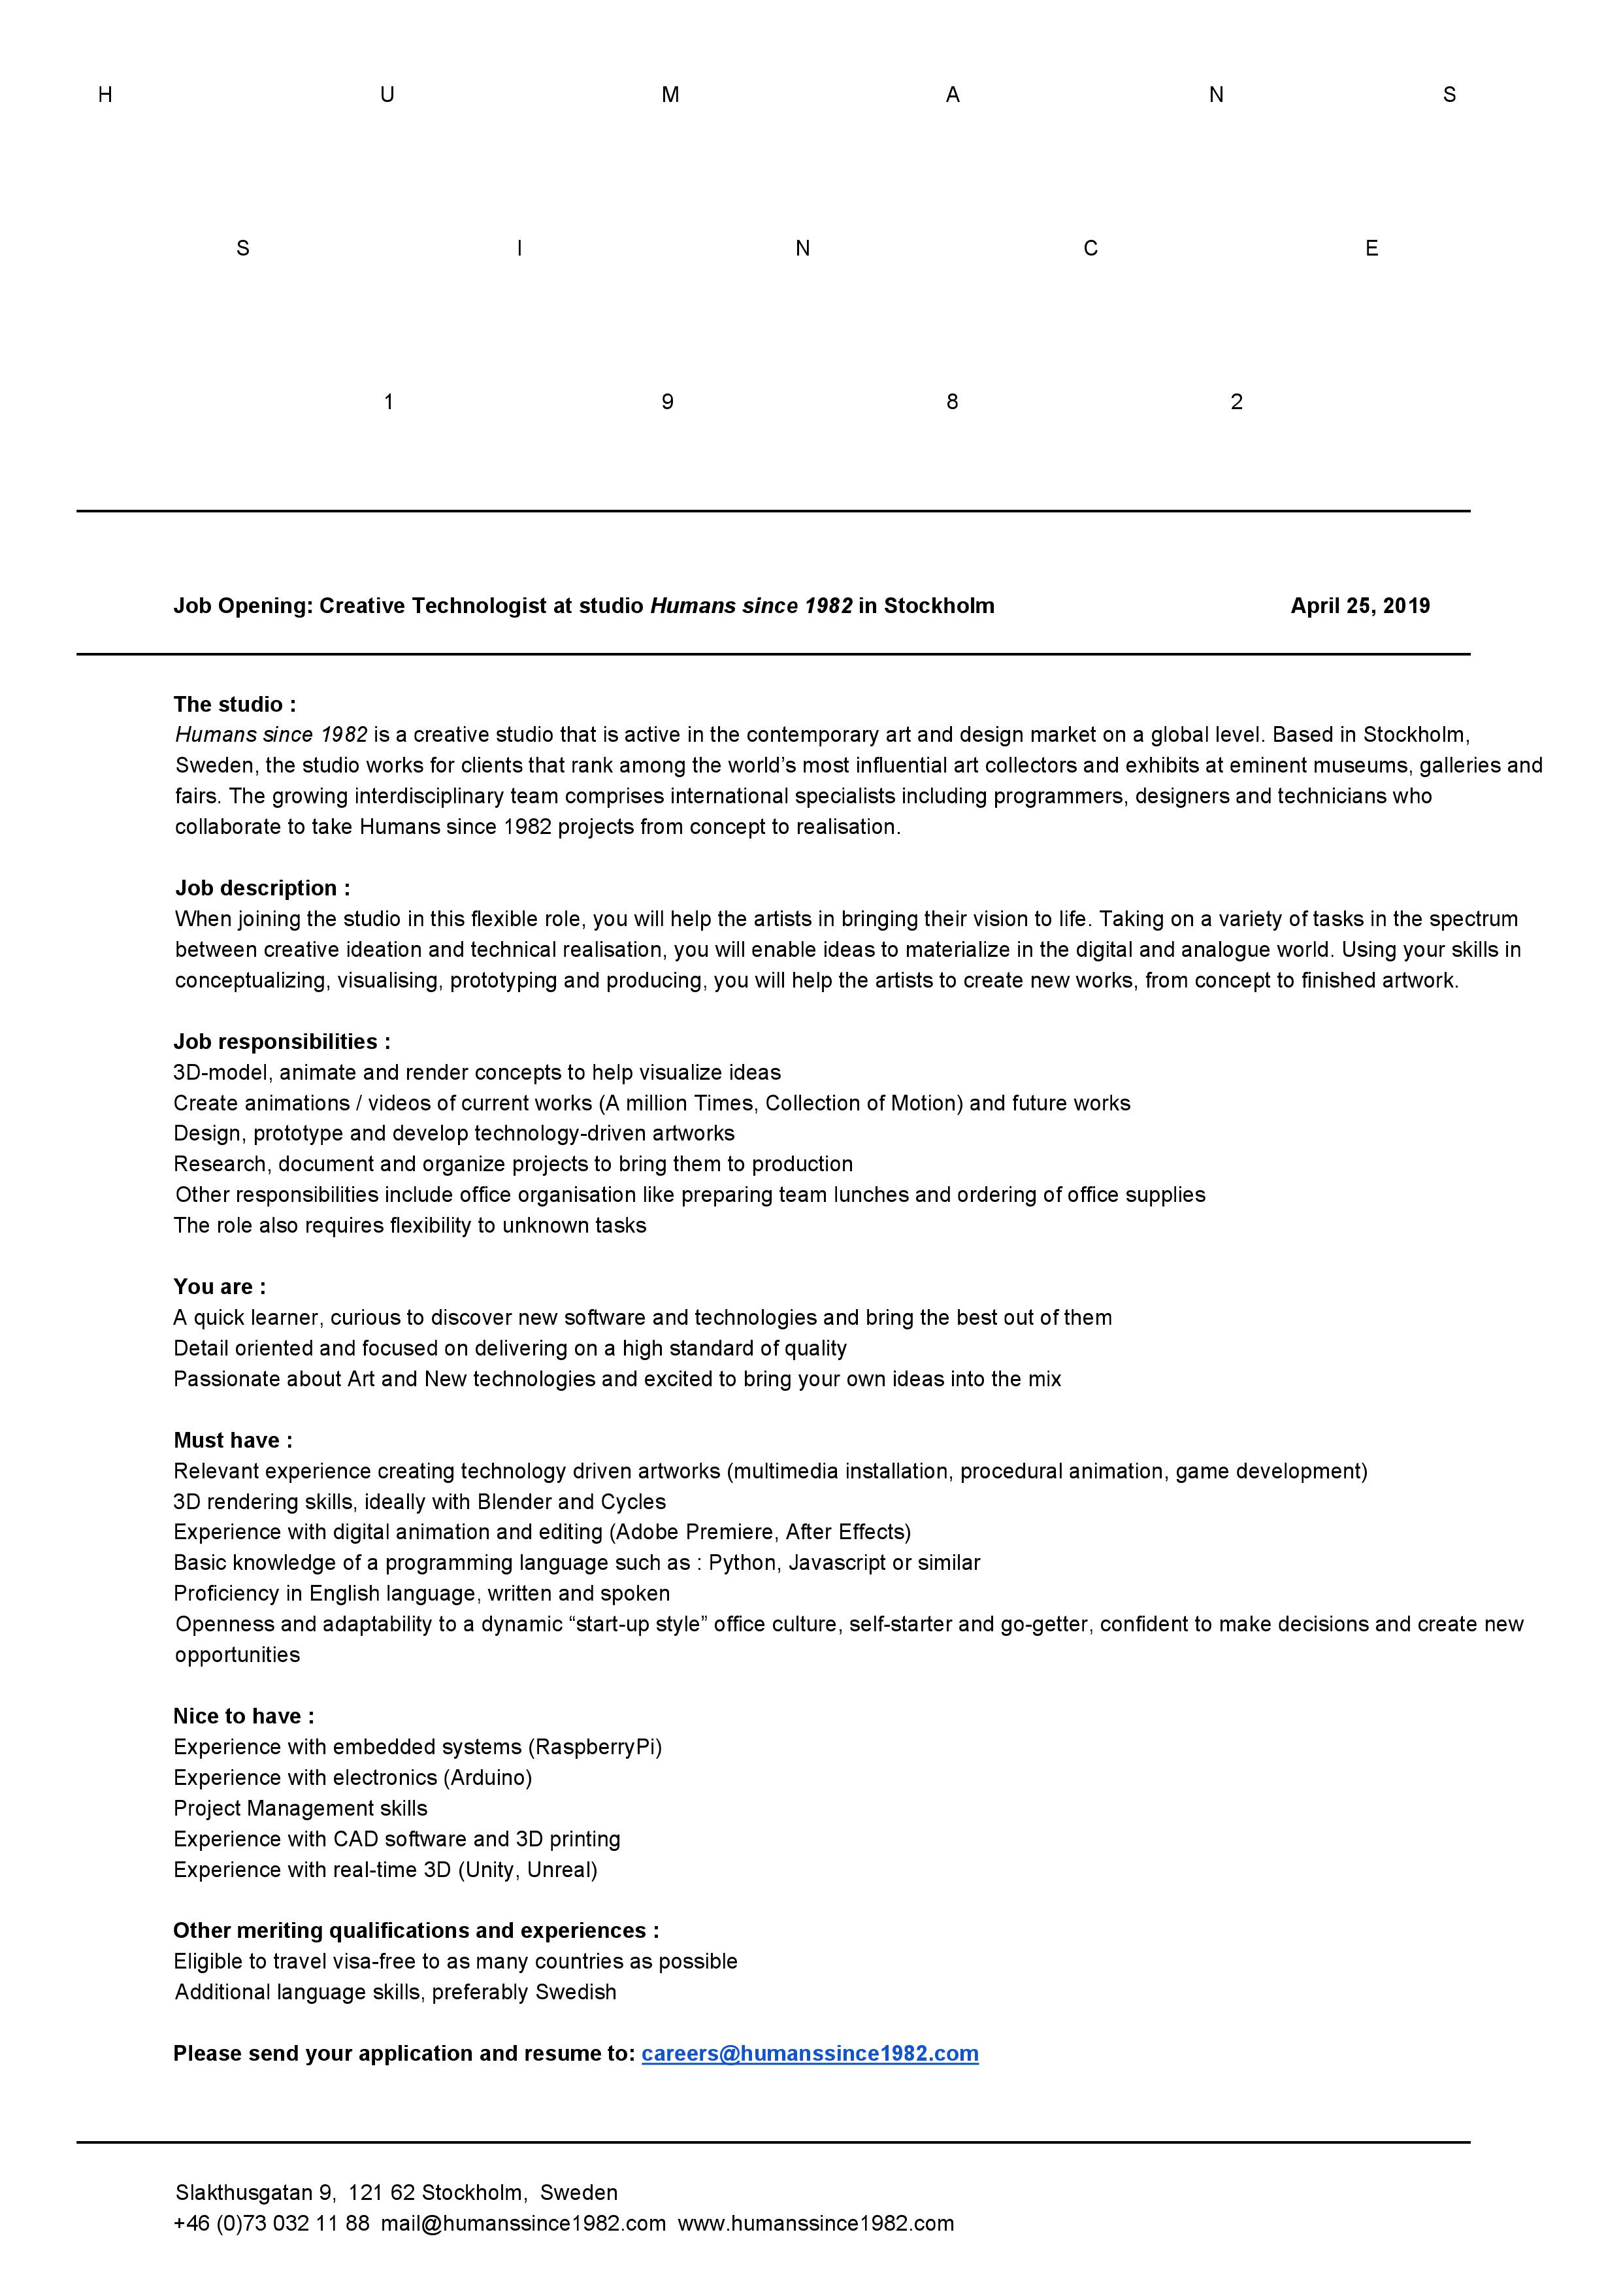 HS1982 Job Opening Creative Technologist.jpg